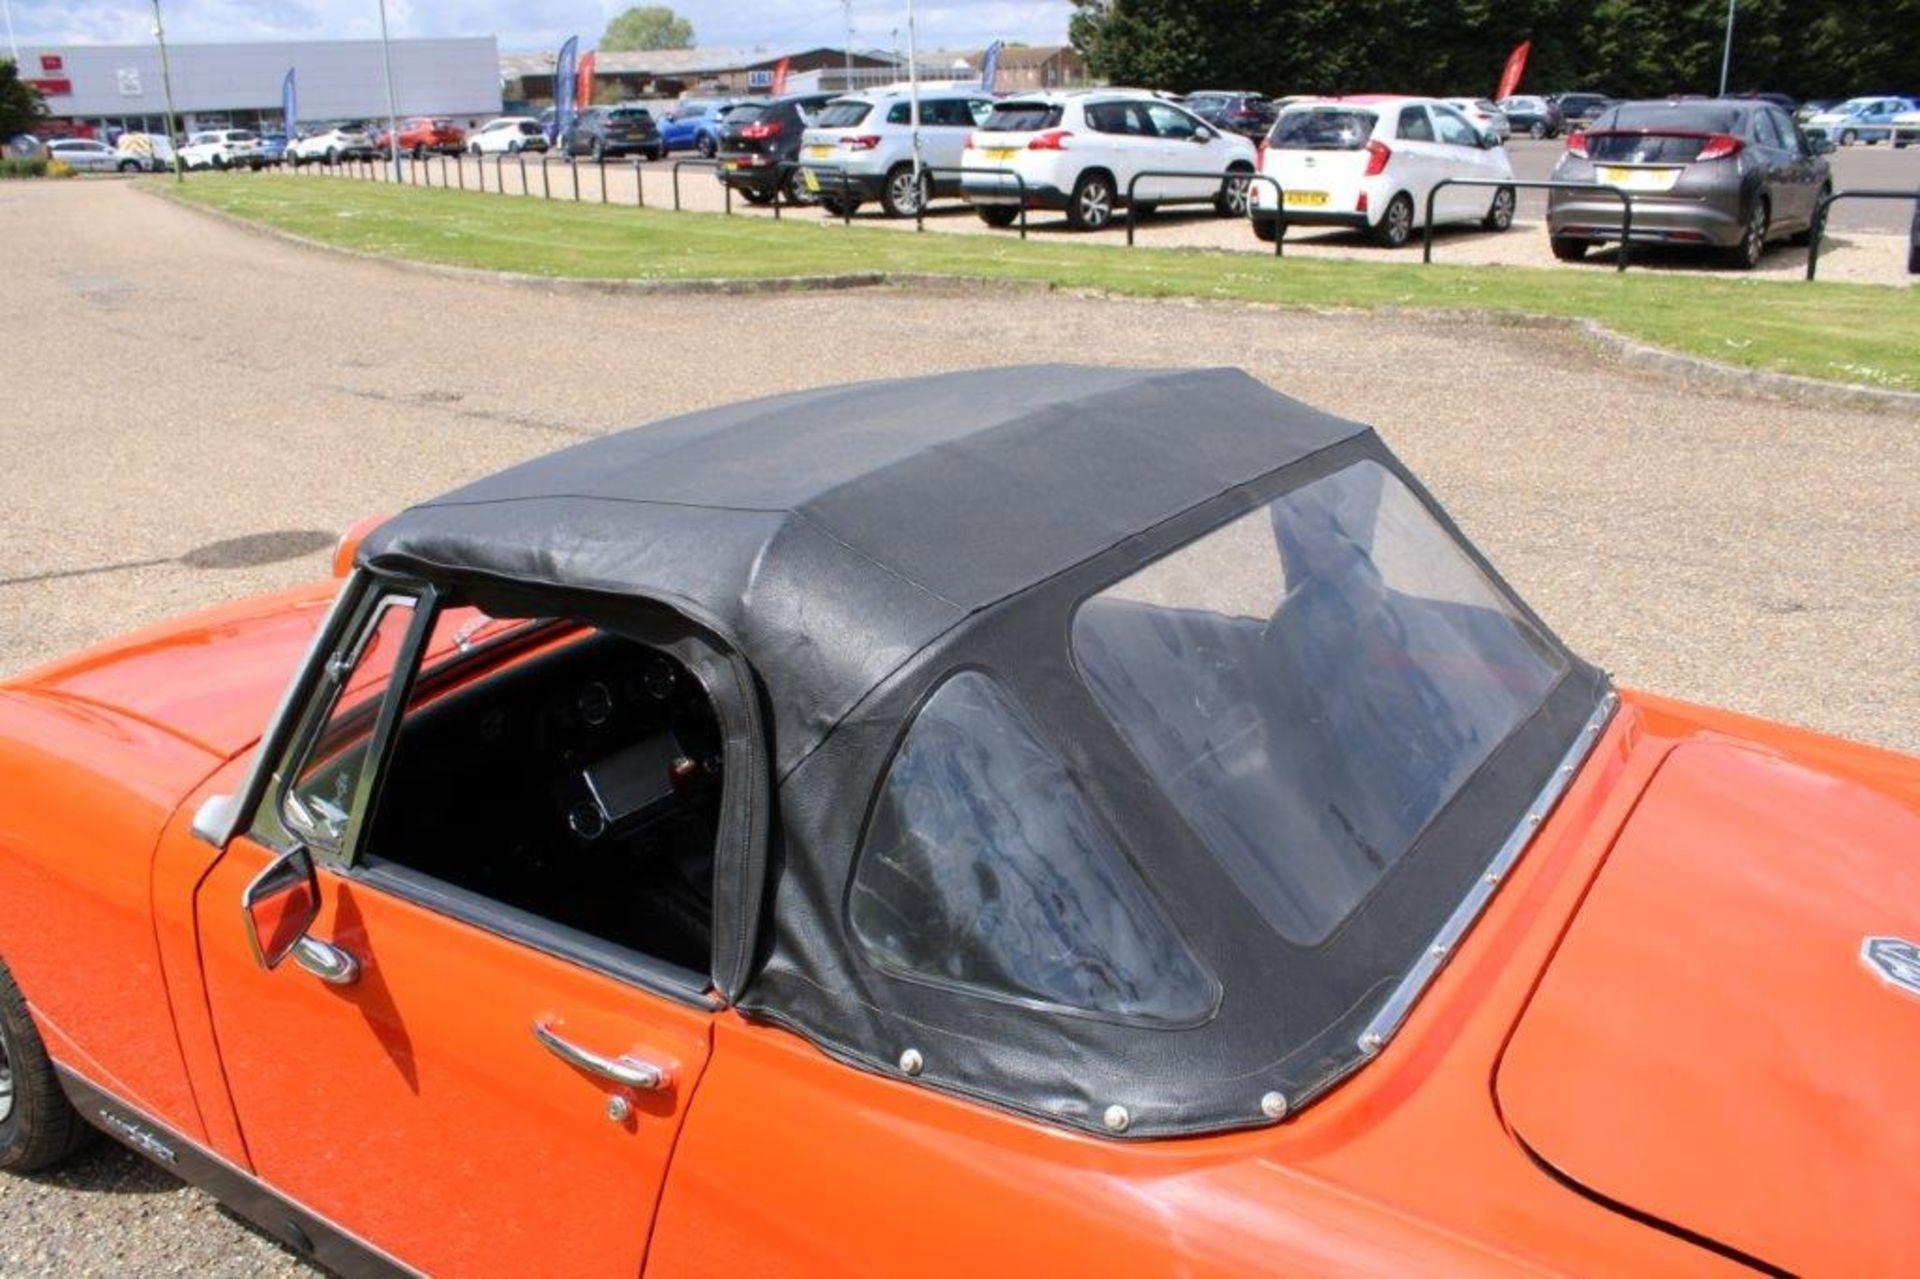 1979 MG Midget 1500 - Image 36 of 37